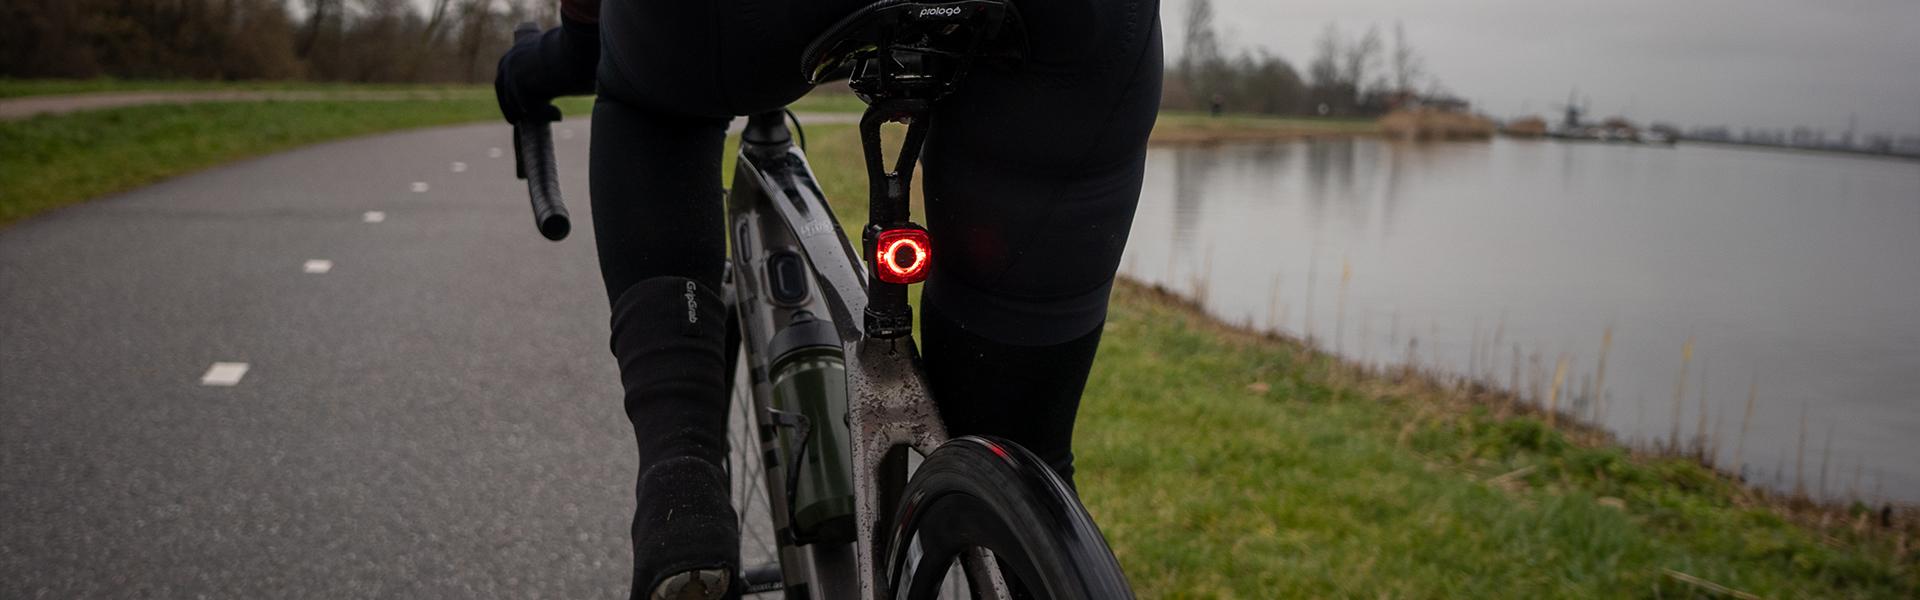 LF-12 Sate-Lite newest bicycle headlight